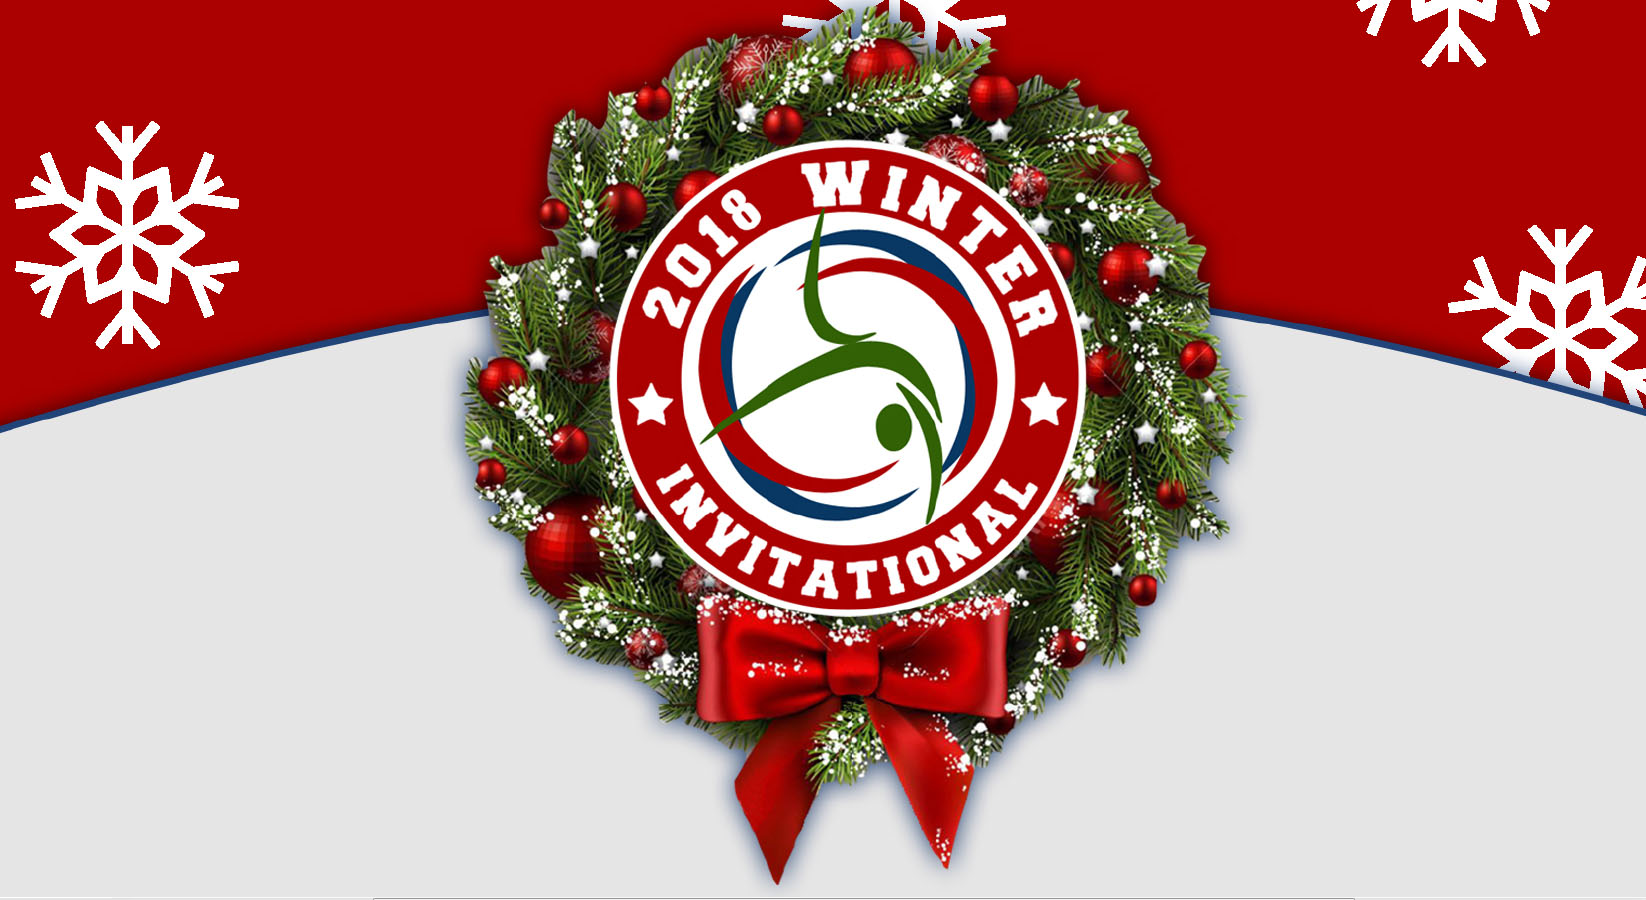 Winter Invitational Gymnastics Meet Greenville Sc   Newsinvitation.co